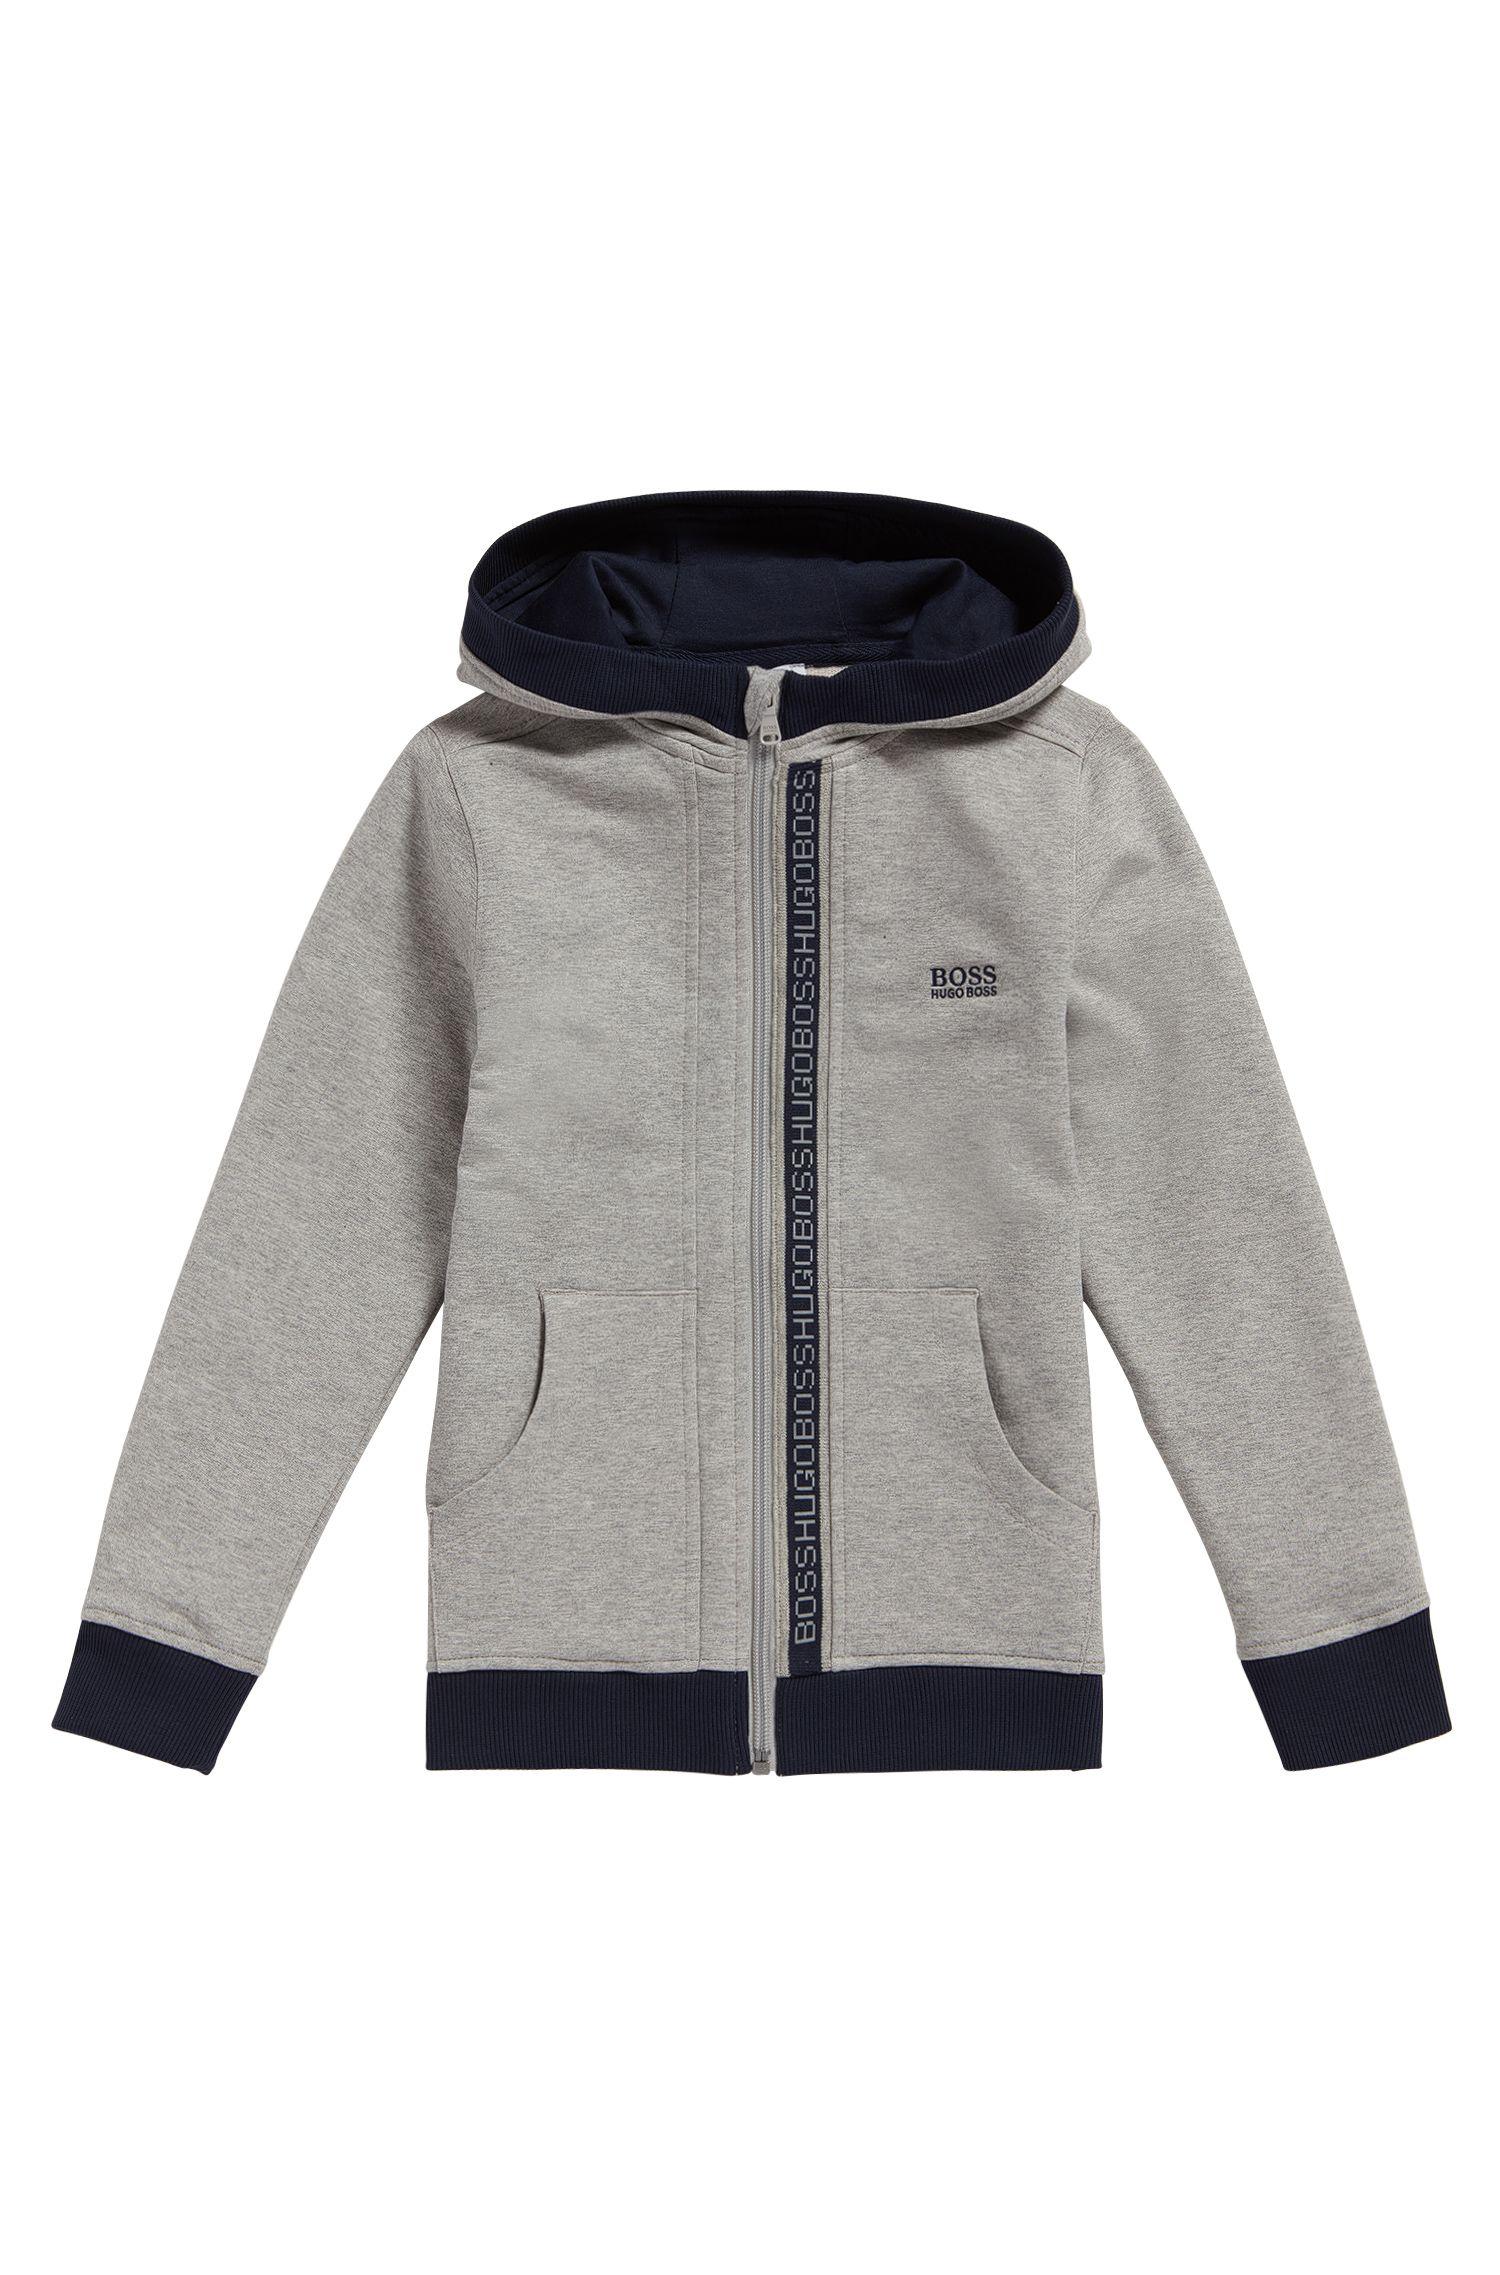 Kids-Sweatshirt-Jacke aus Stretch-Baumwolle mit Kapuze: 'J25P02'